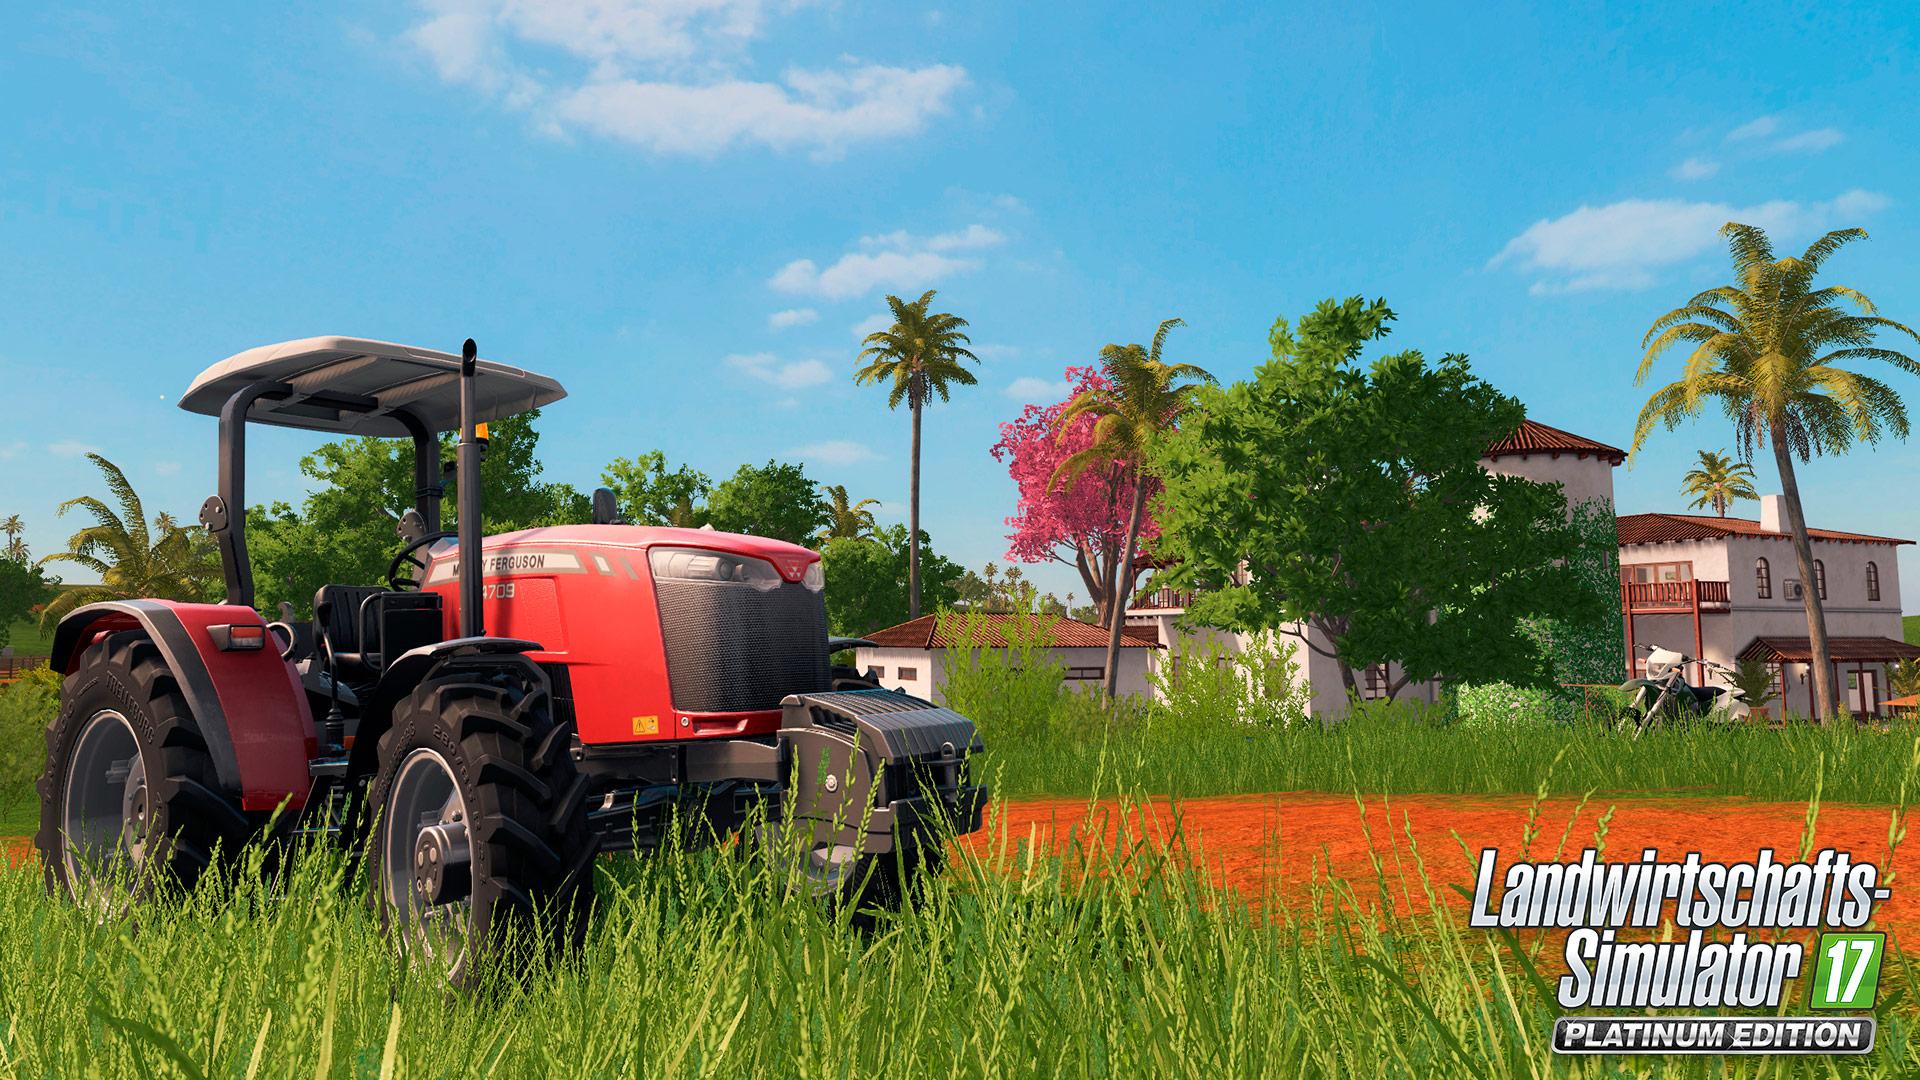 Landwirtschafts-Simulator 17: Platinum Edition angekündigt